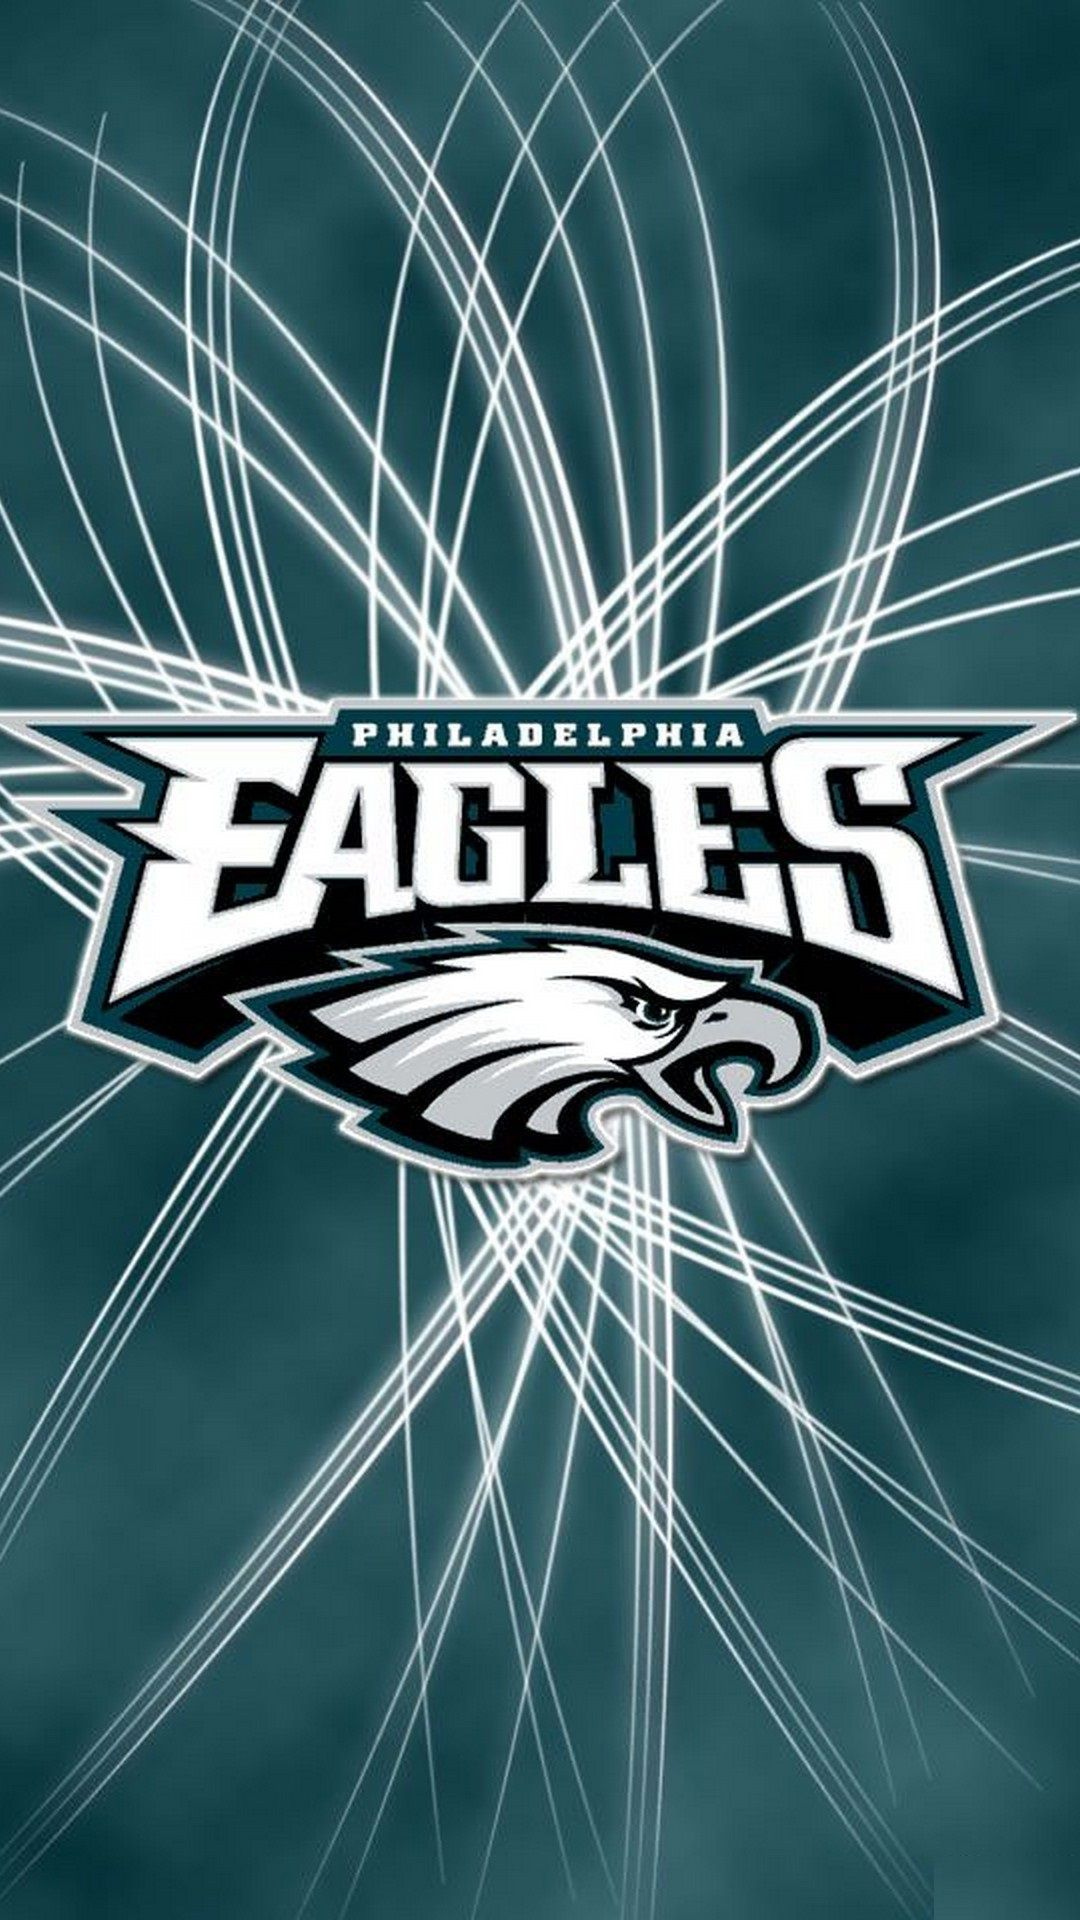 Phila Eagles Iphone 7 Plus Wallpaper Philadelphia Eagles